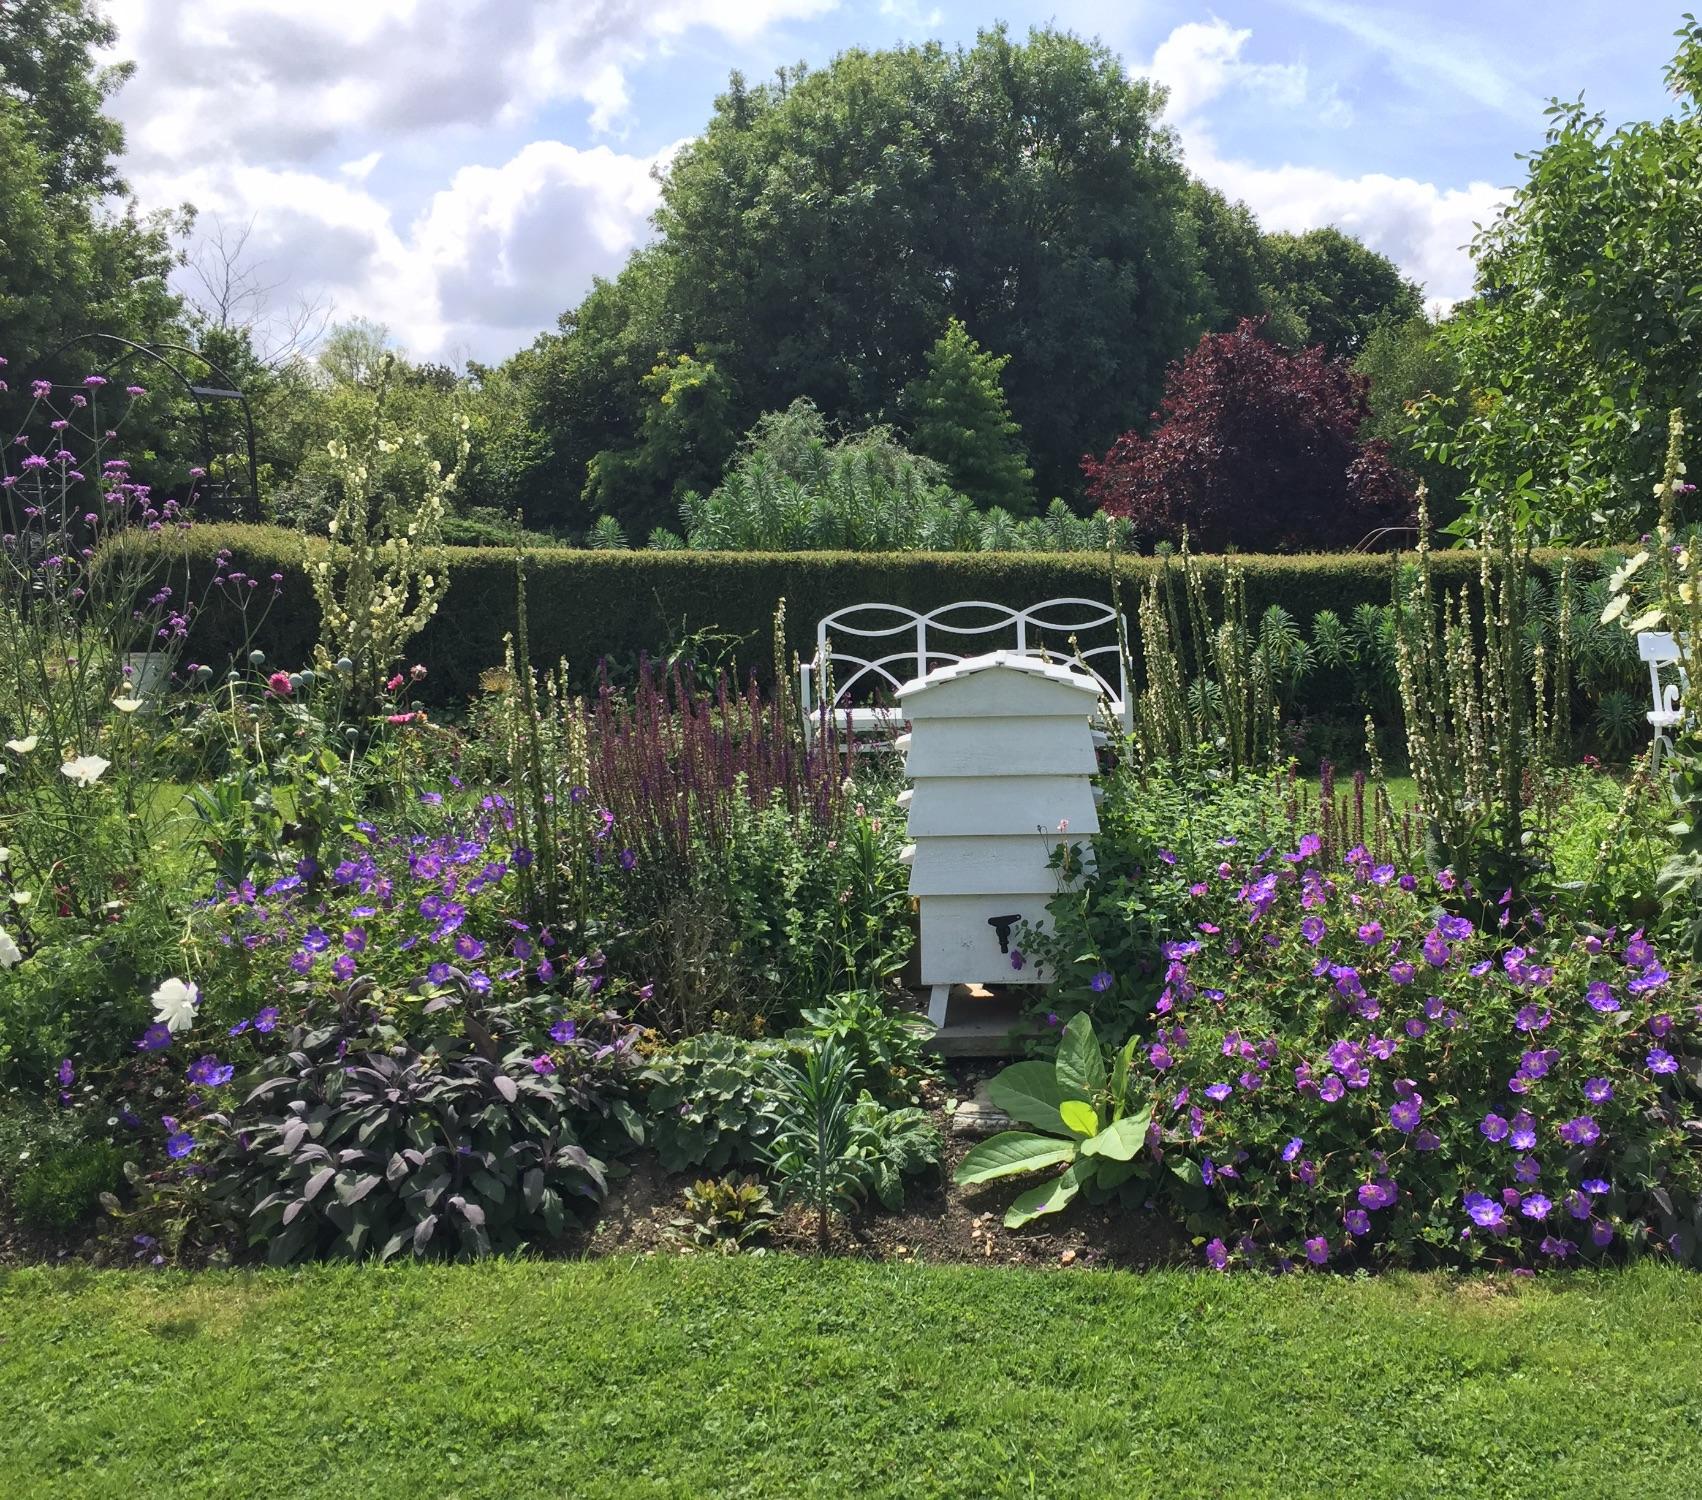 Pollinator Bed